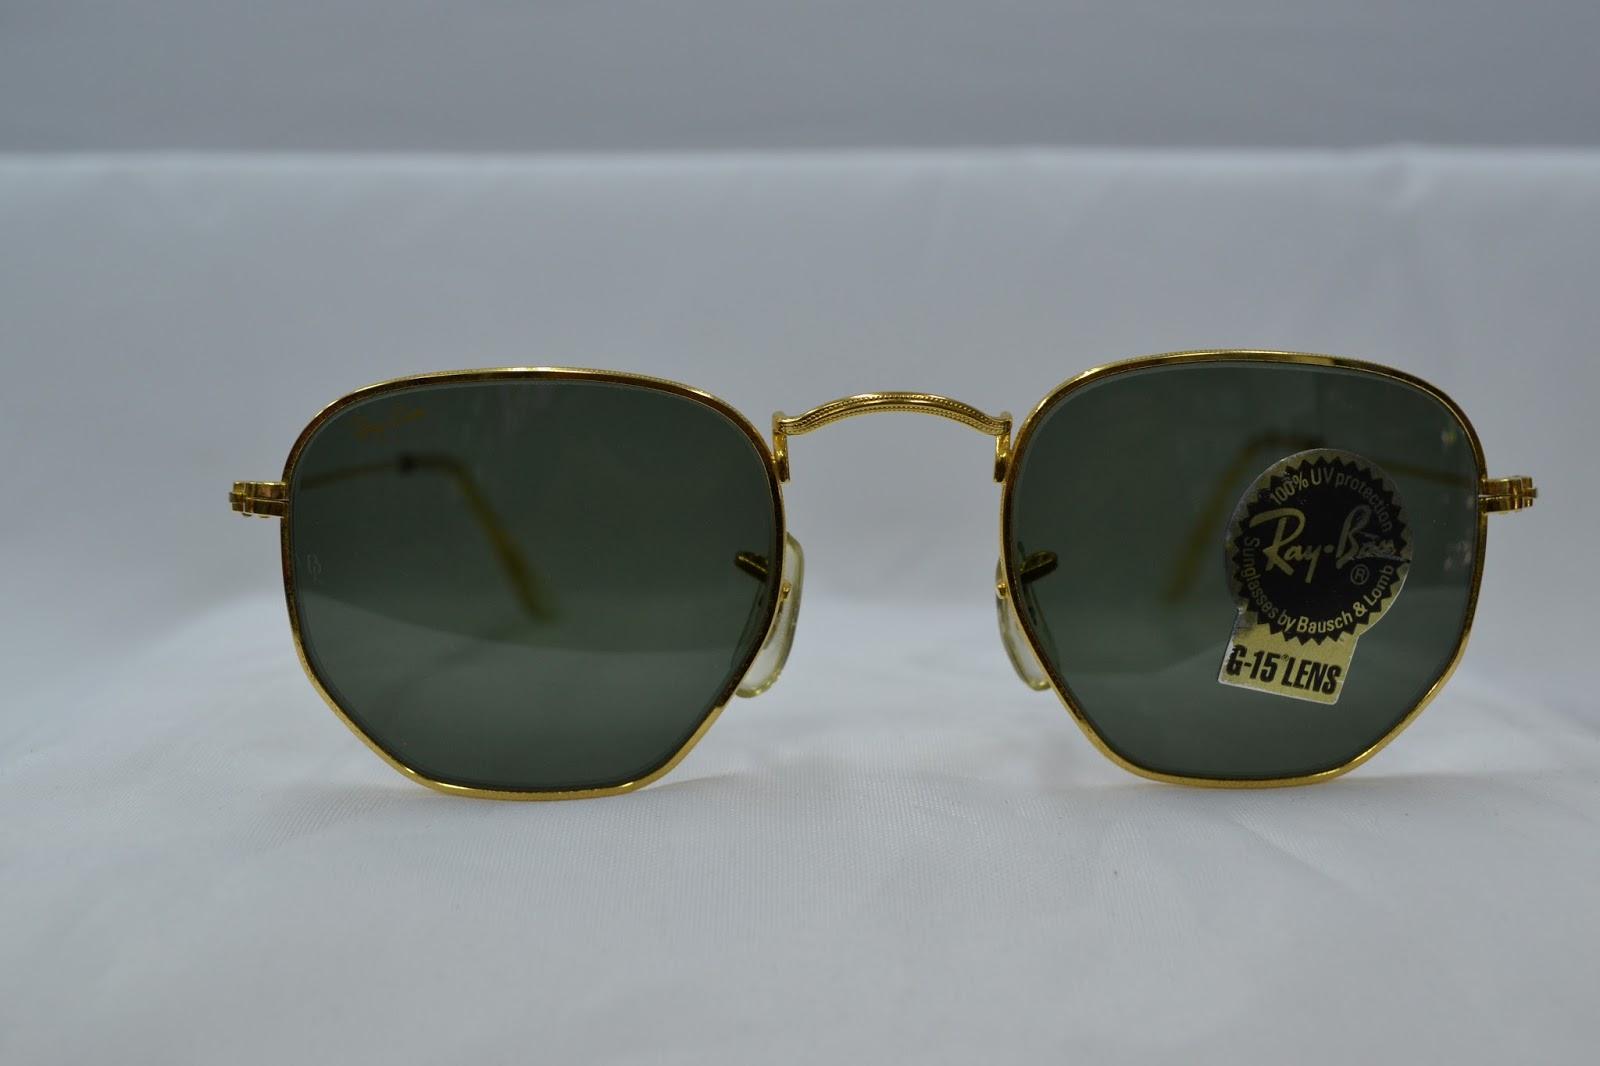 9973c84c388 Vintage sunglass  Vintage Ray Ban W0980